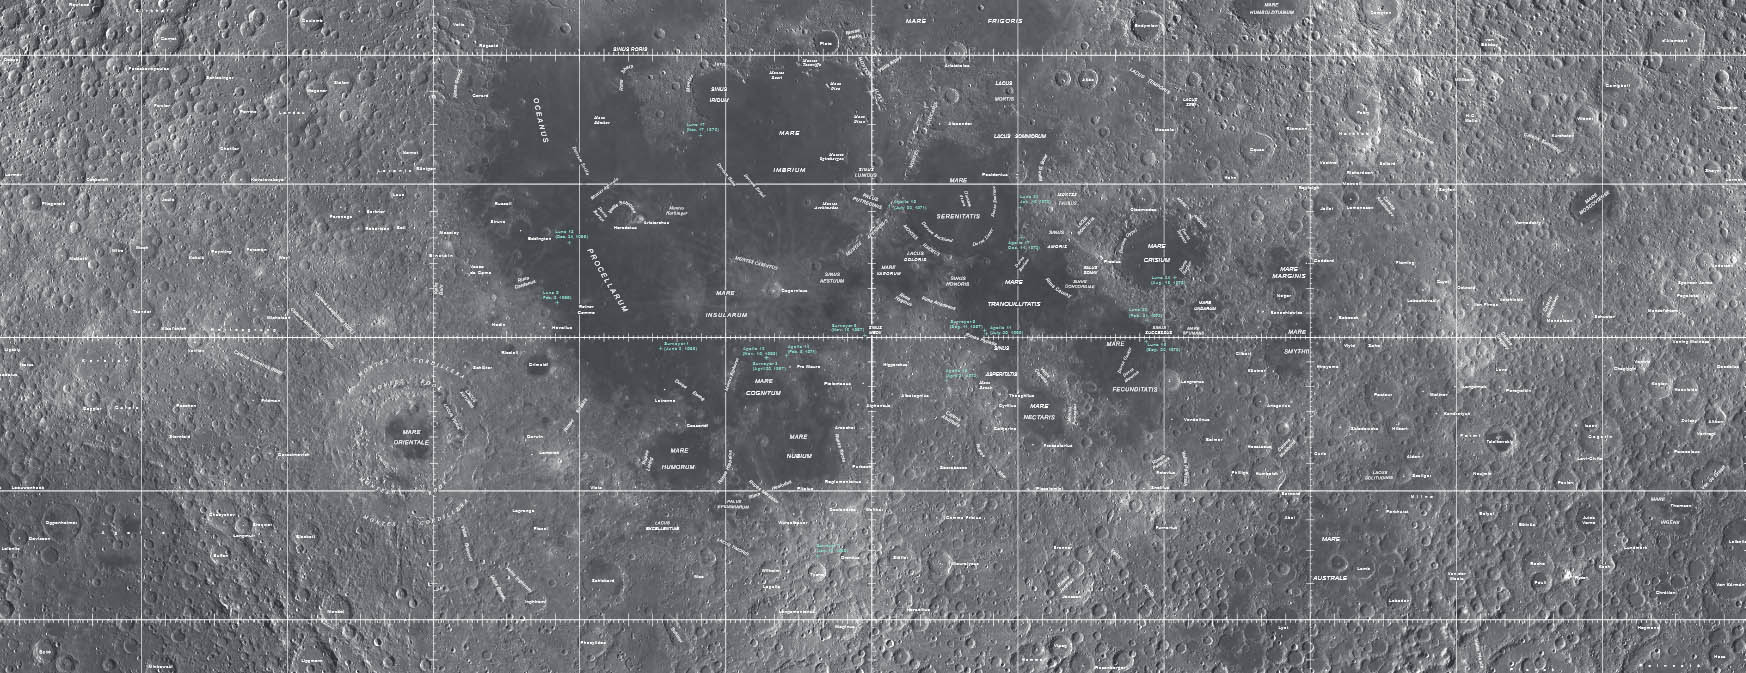 USGS Lunar Map Visual Mercator